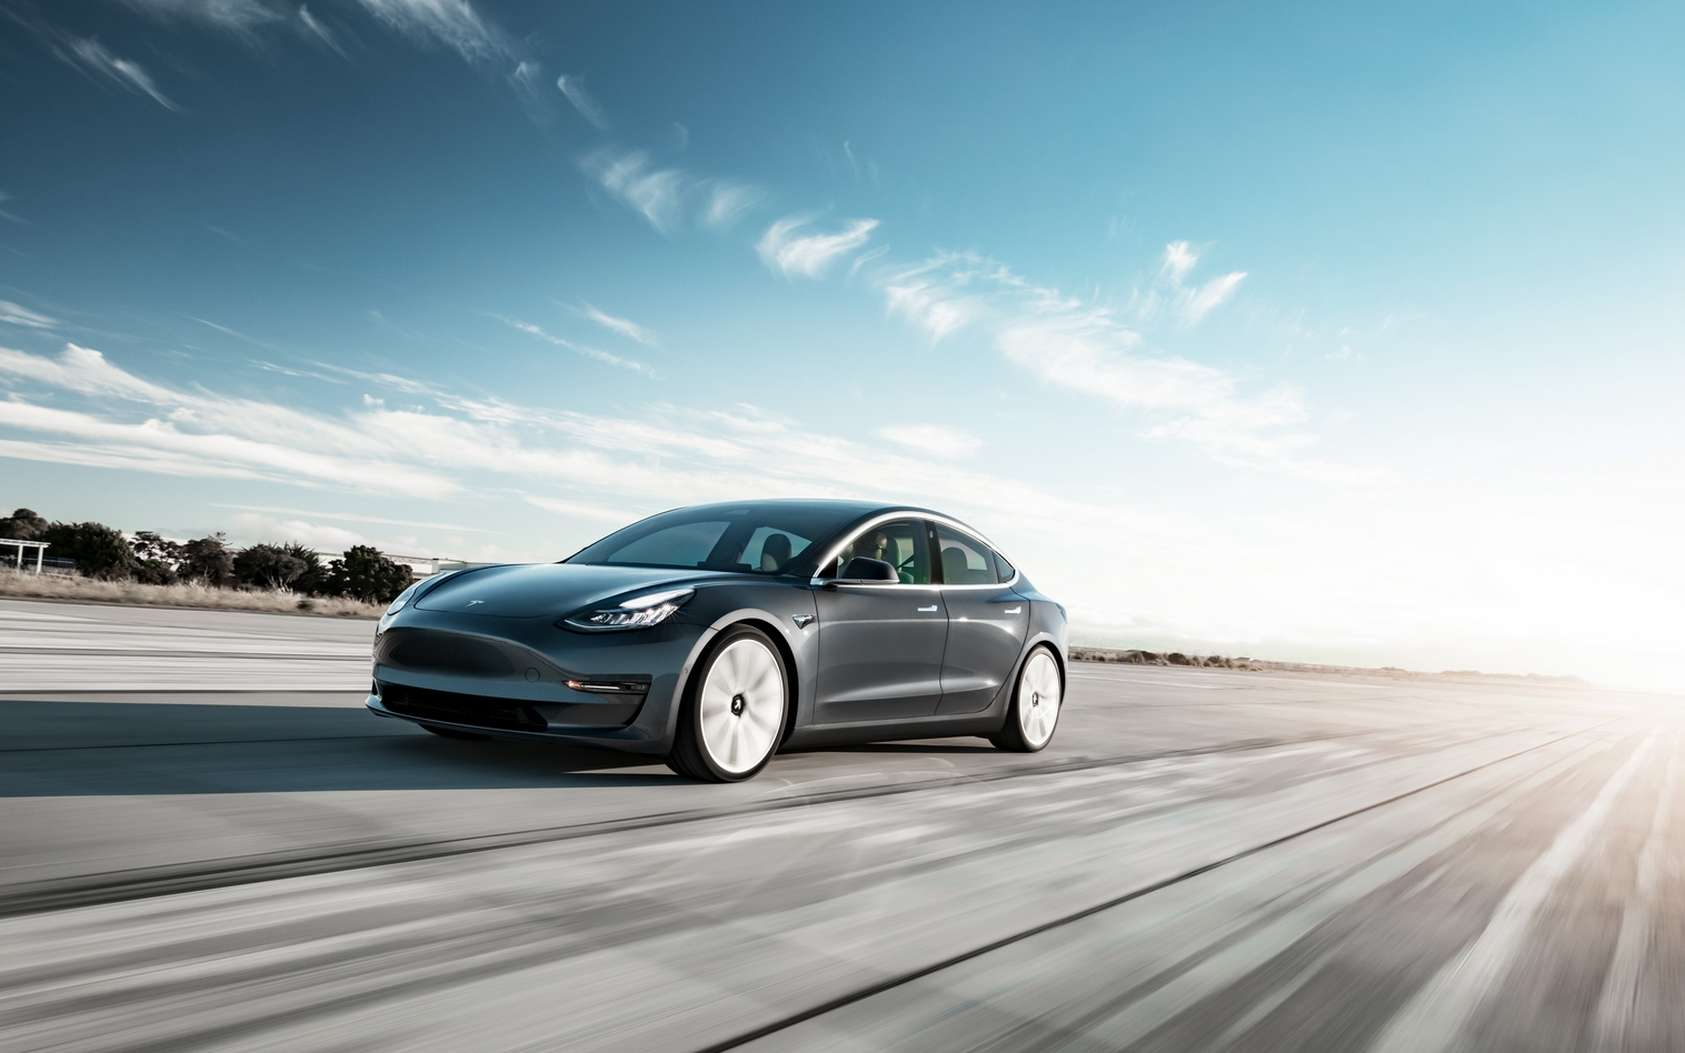 La Tesla Model 3 standard ne sera pas disponible avant six mois en Europe. © Tesla